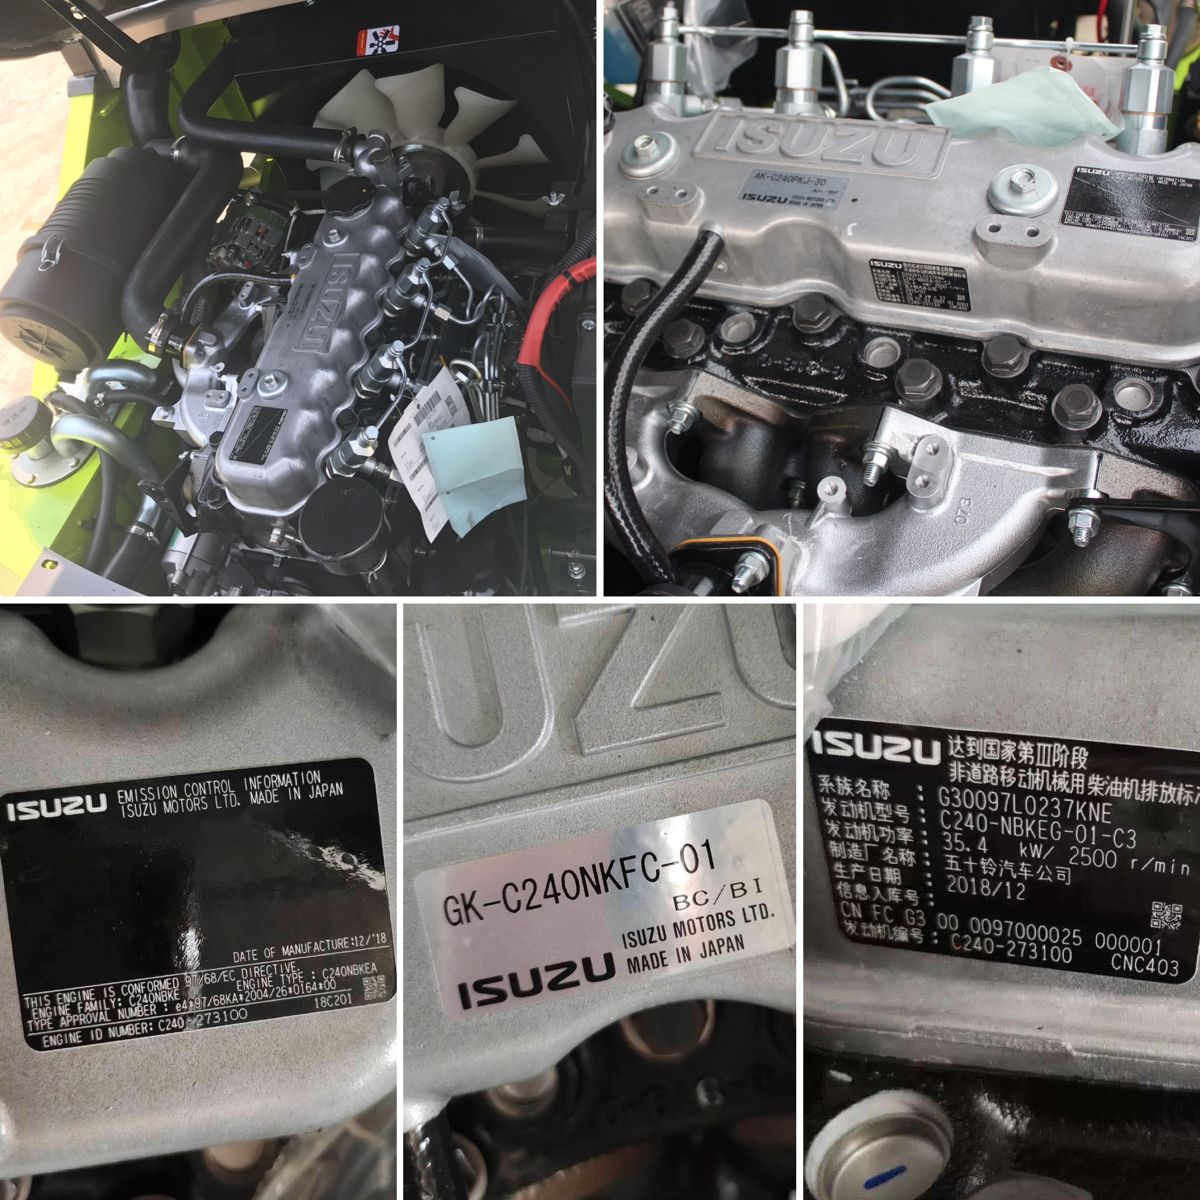 Original Isuzu Engine Made In Japan Japanese Engines Forklift Japan